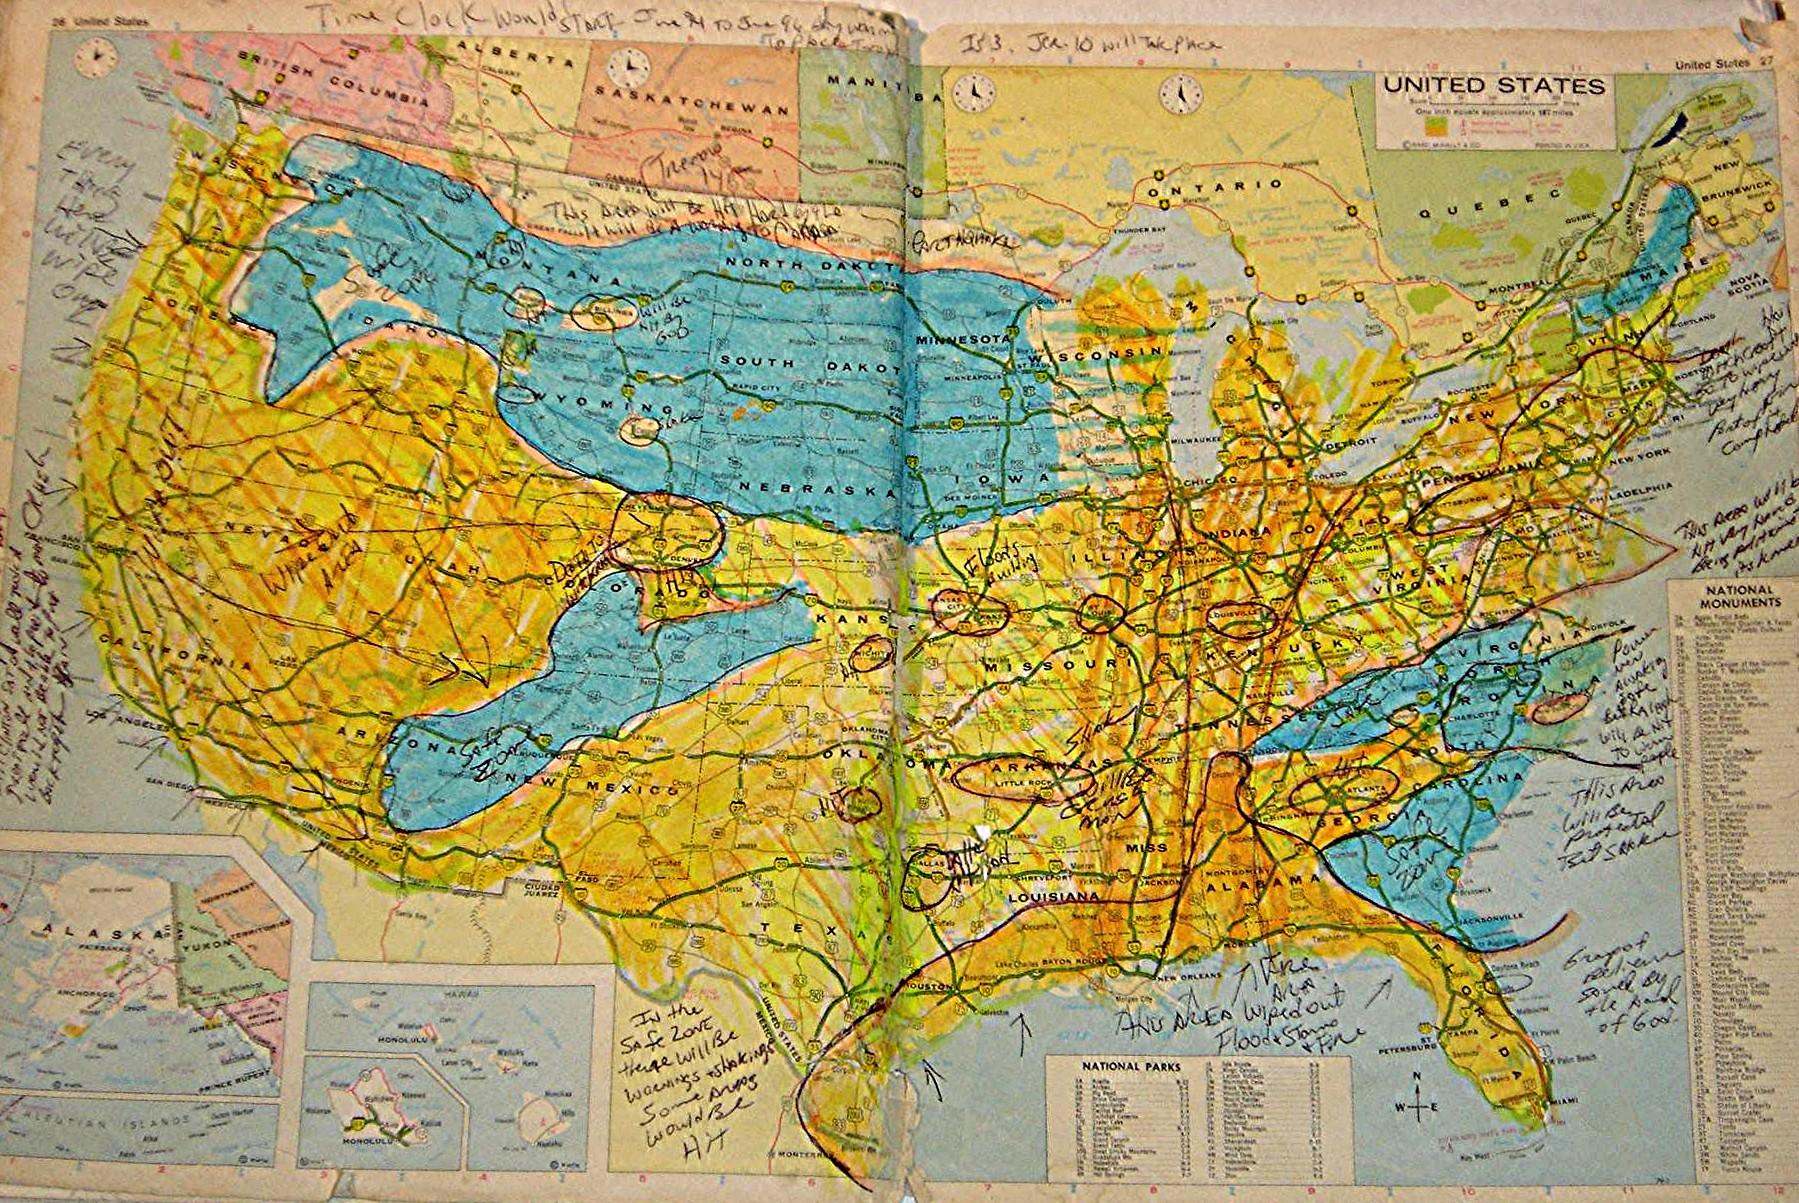 MAPVIEWGAMMADIM VISIONUSAPROPHETCOMStephen L Bening - Map of usa with zones